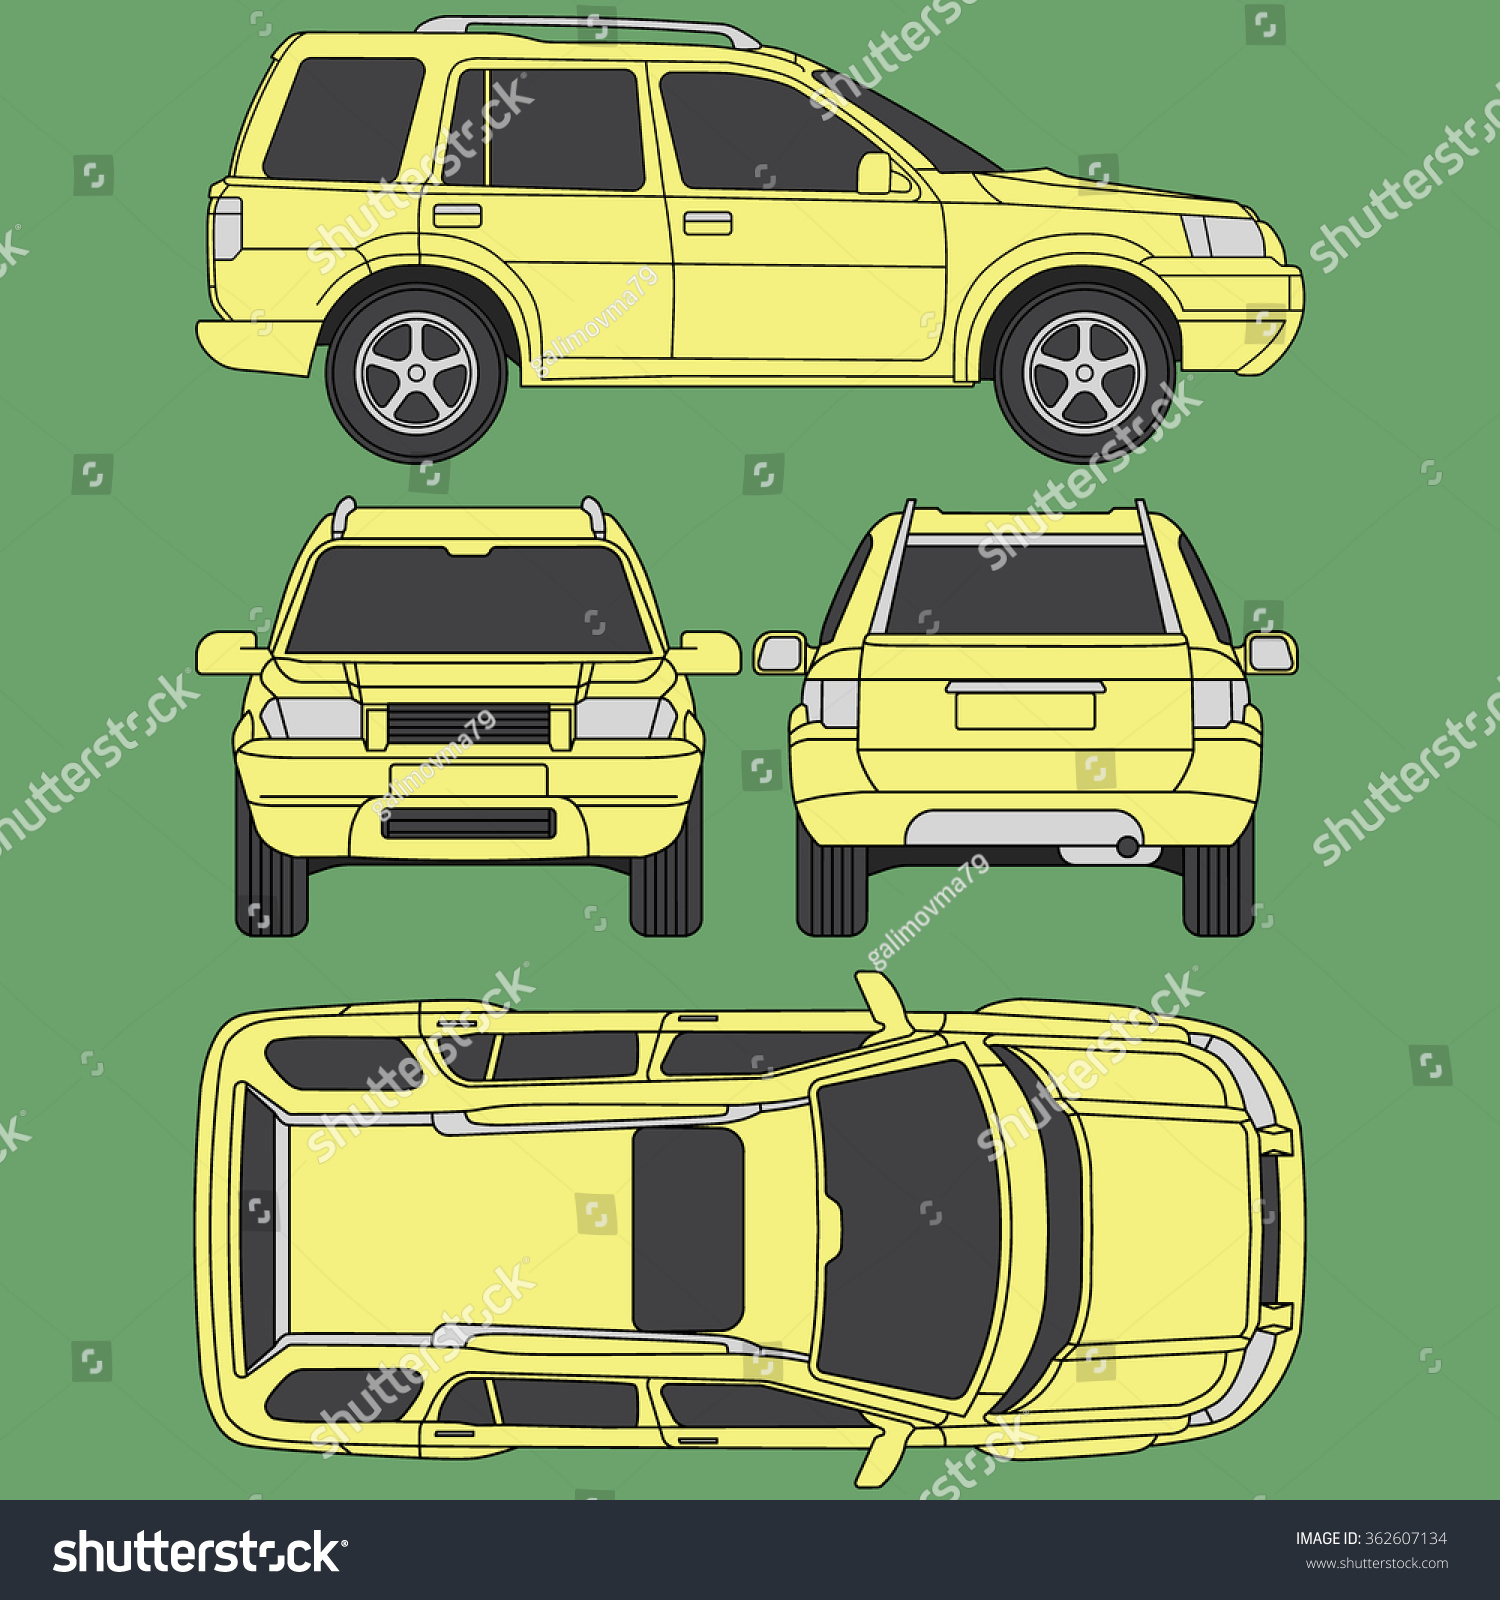 Car Off Road Line Draw Insurance Stock Vector 362607134 - Shutterstock